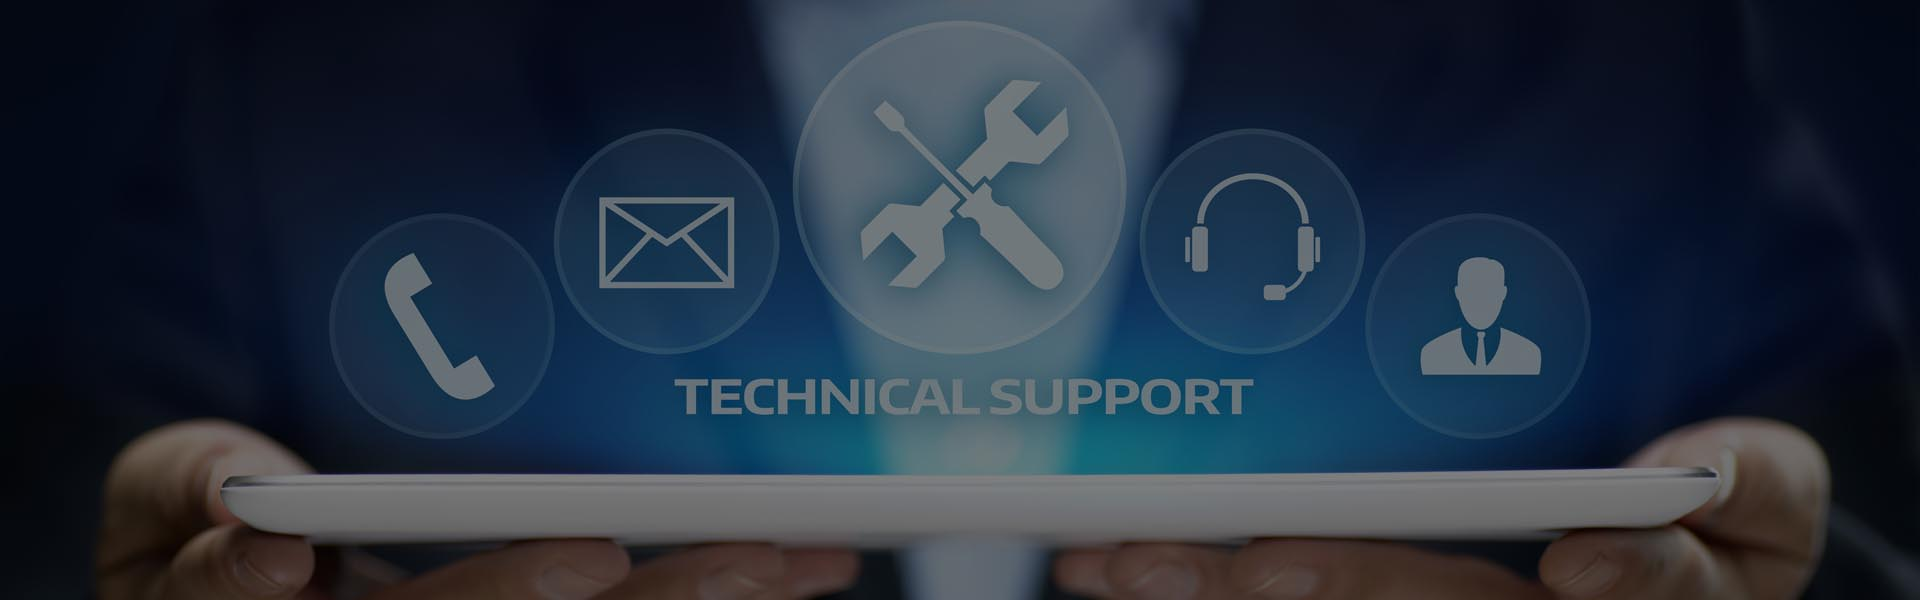 AVITI IT Technical Support